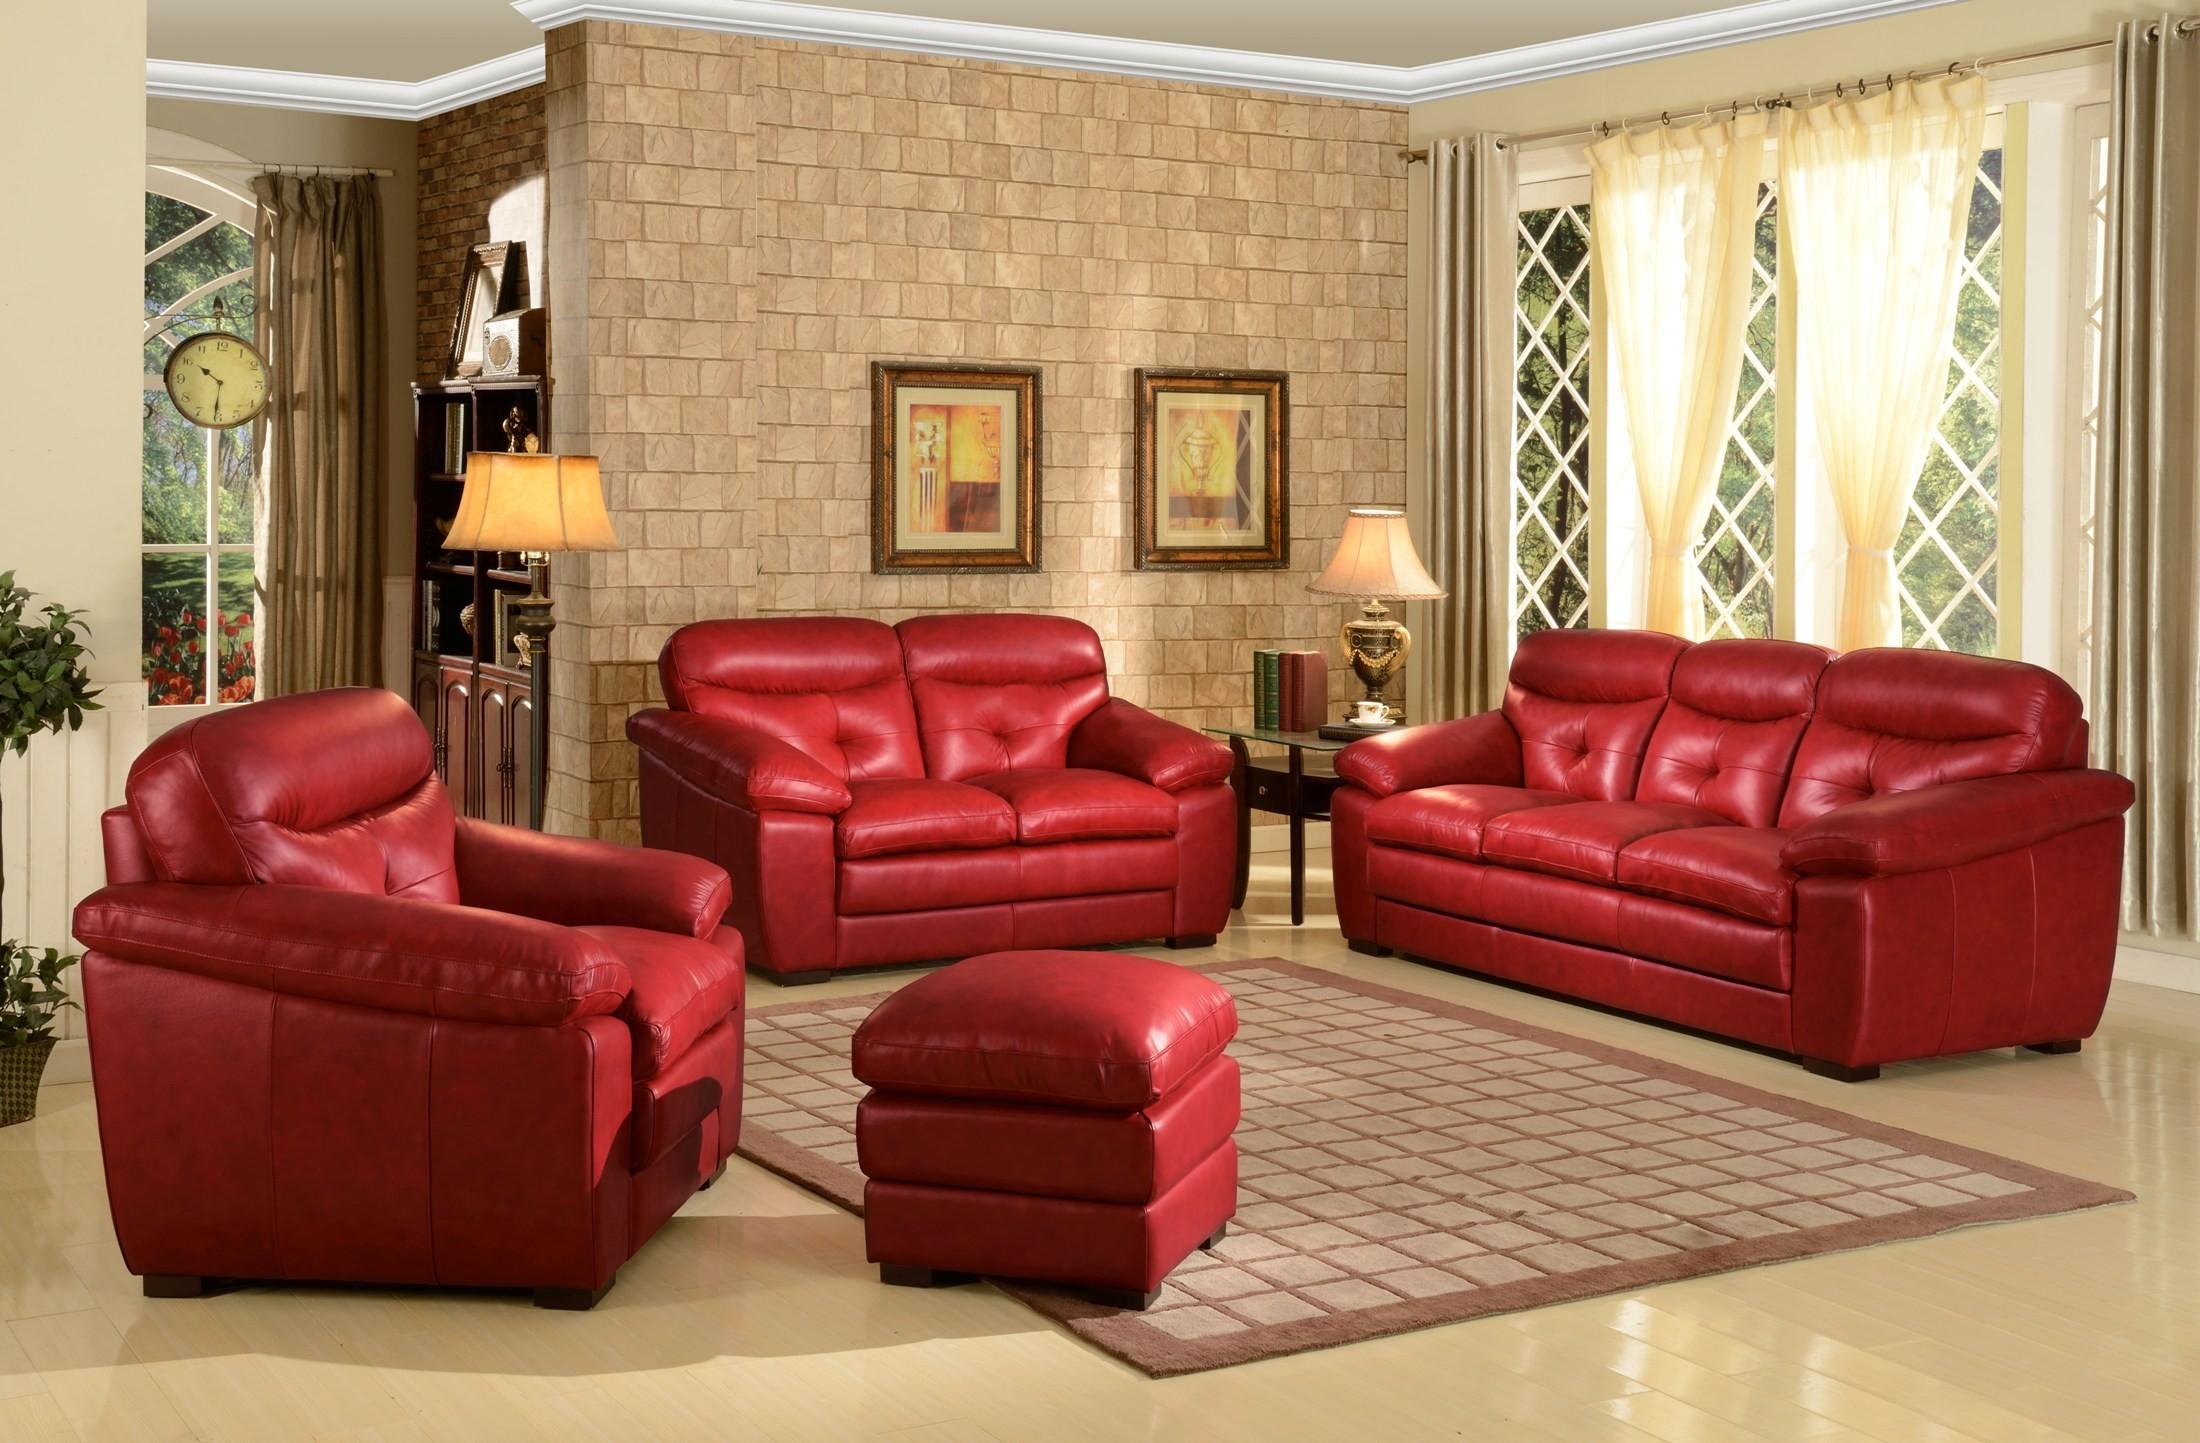 Cambria Mirella Red Living Room Set Leather Italia